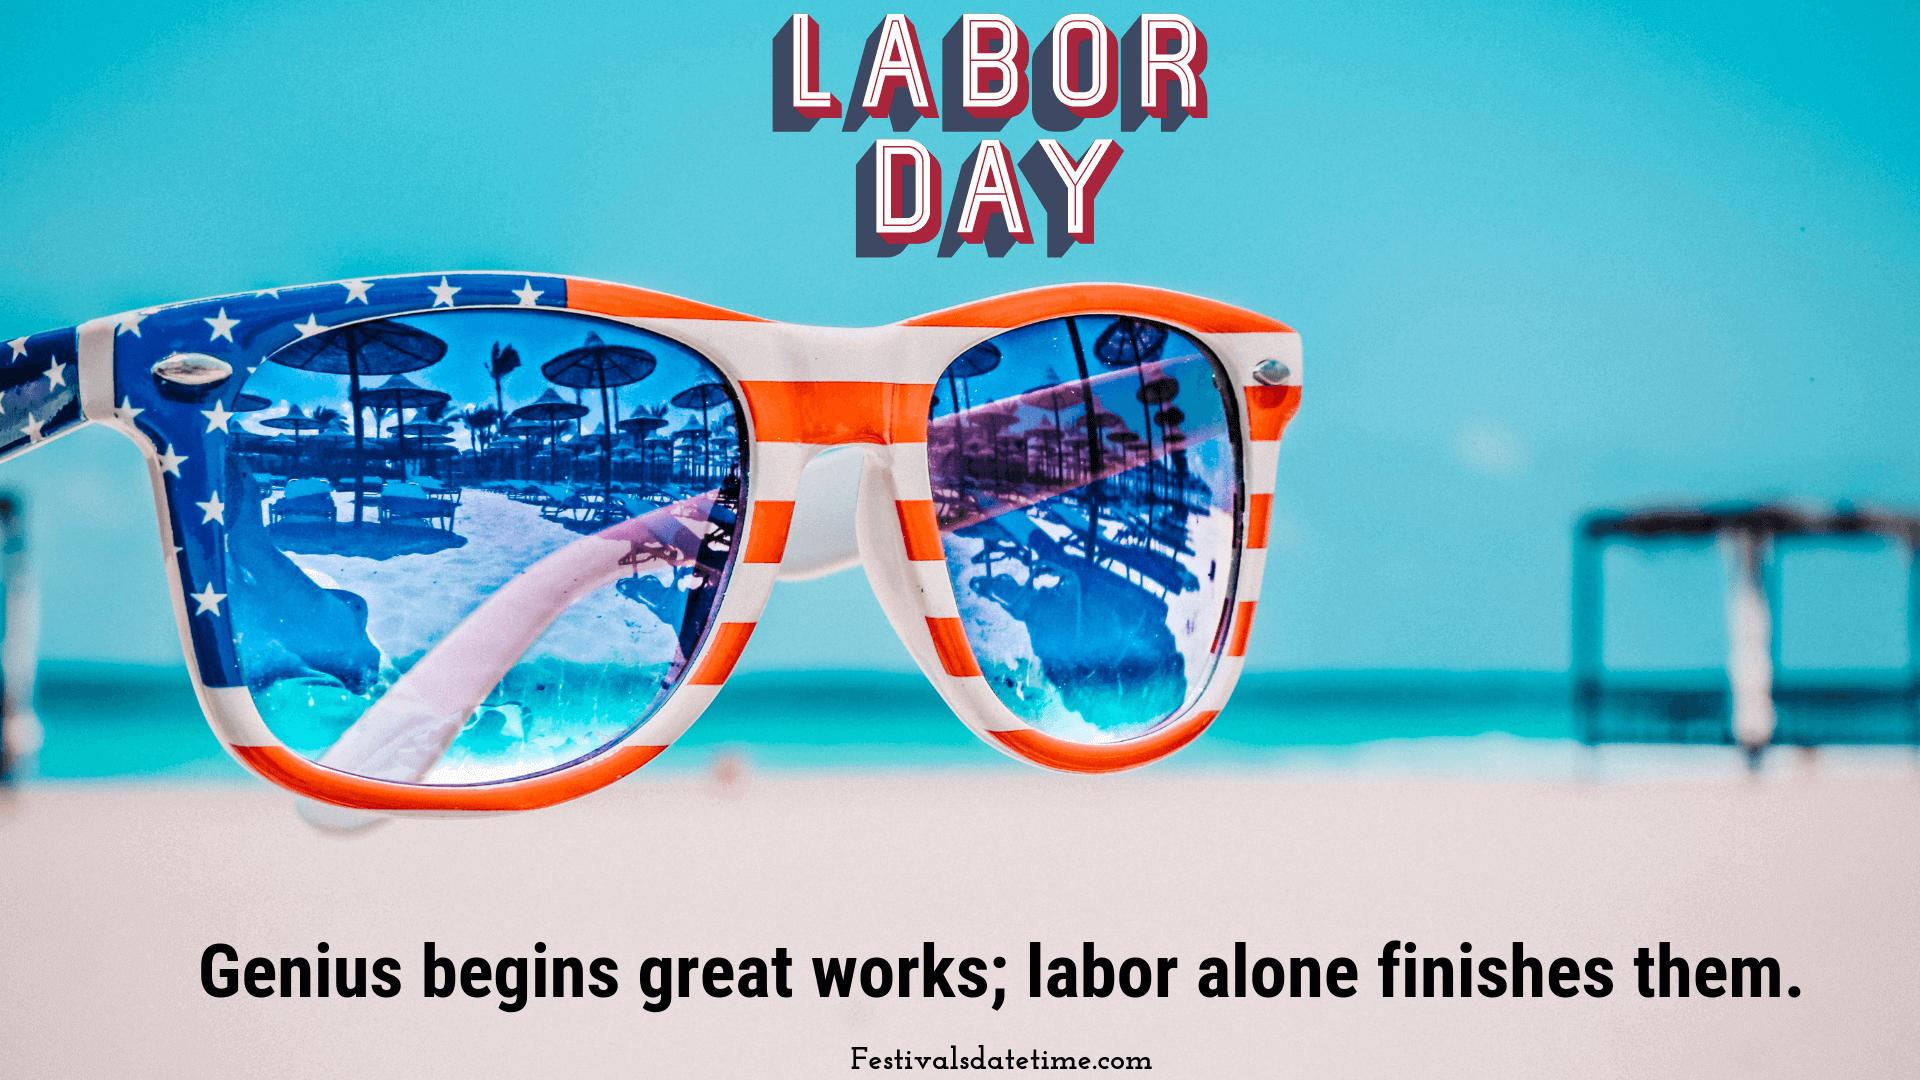 labor day celebration images